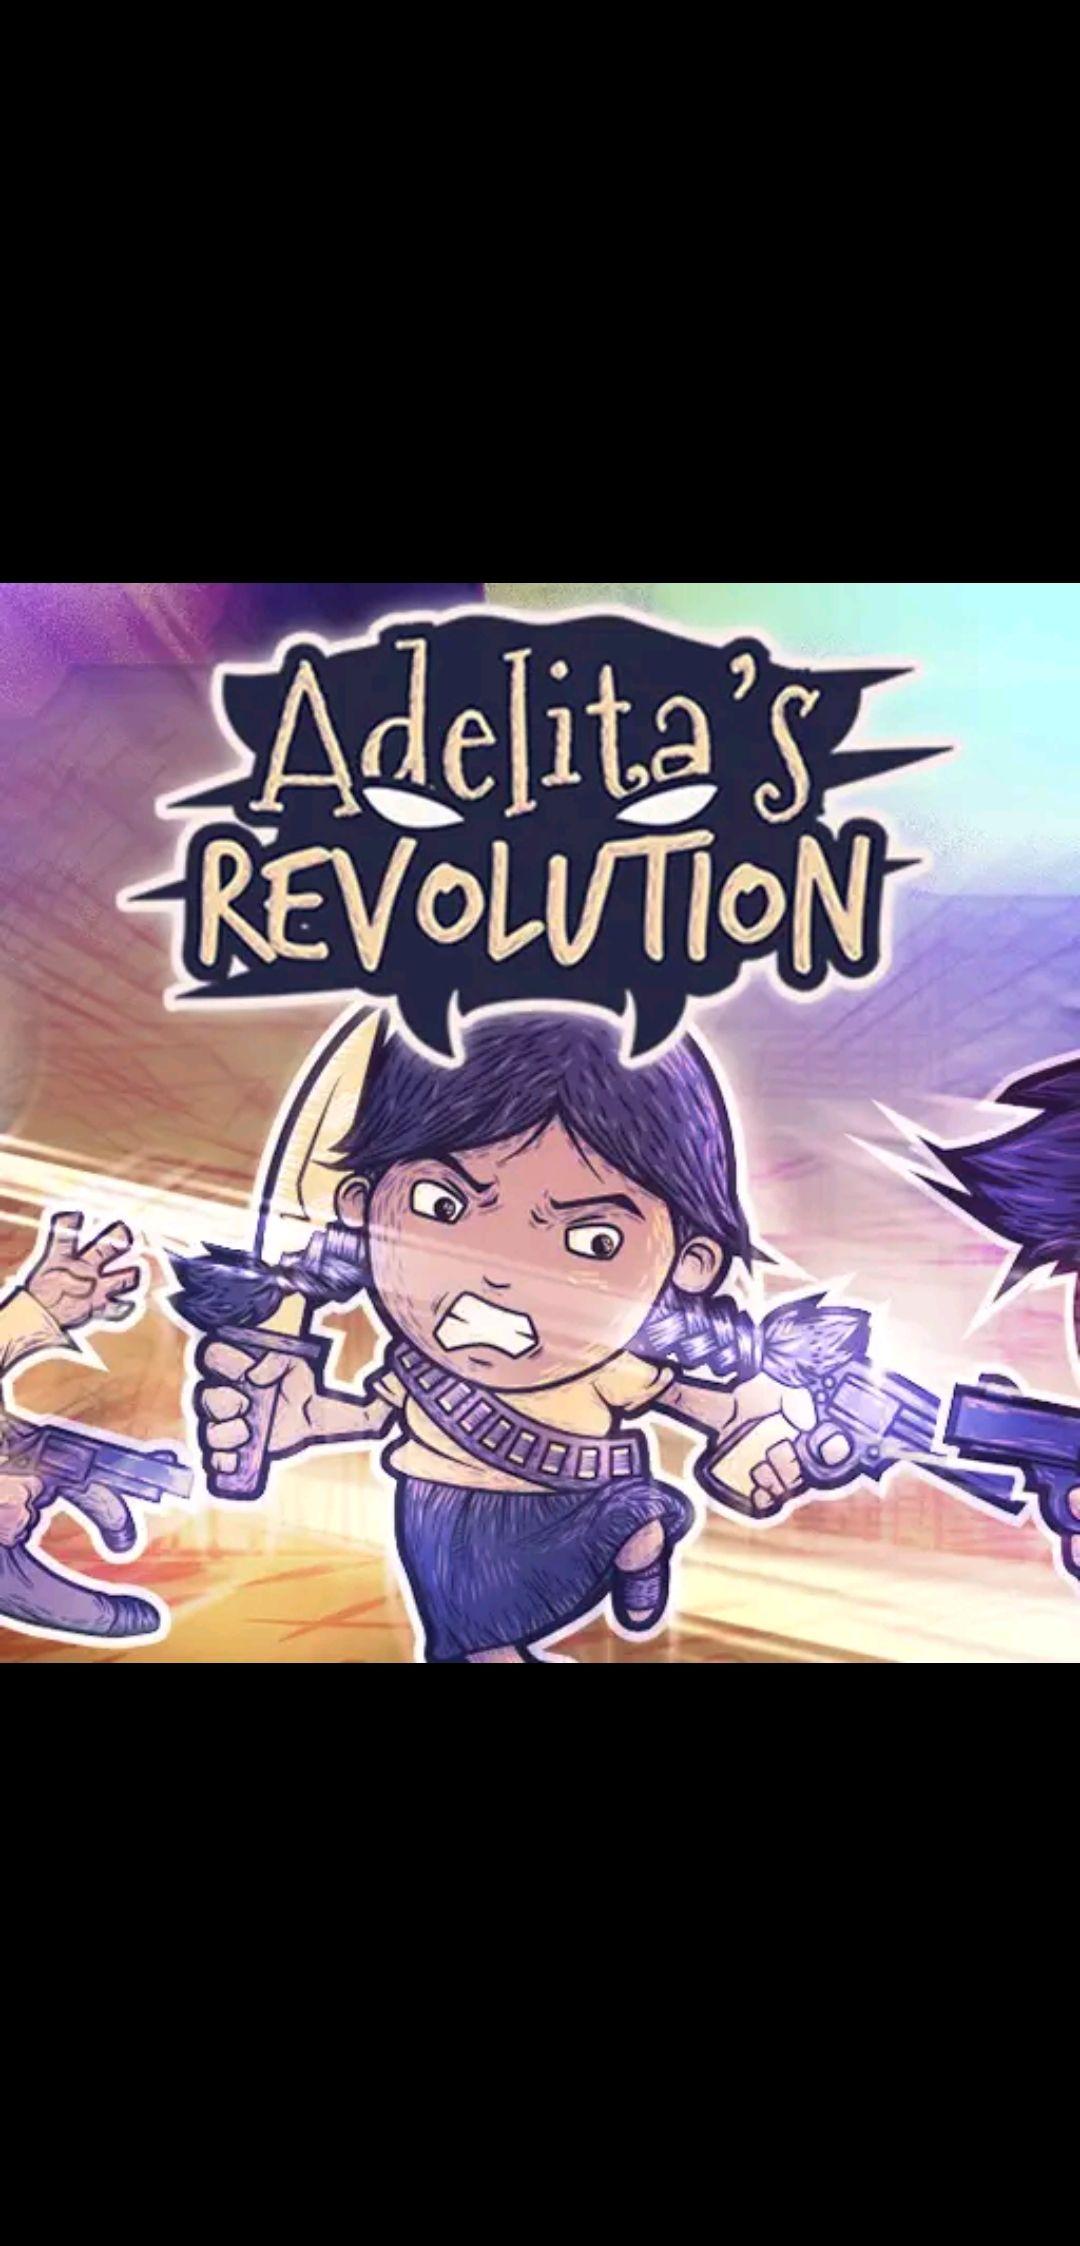 Adelita's revolution(android) vandaag gratis ipv 2,29